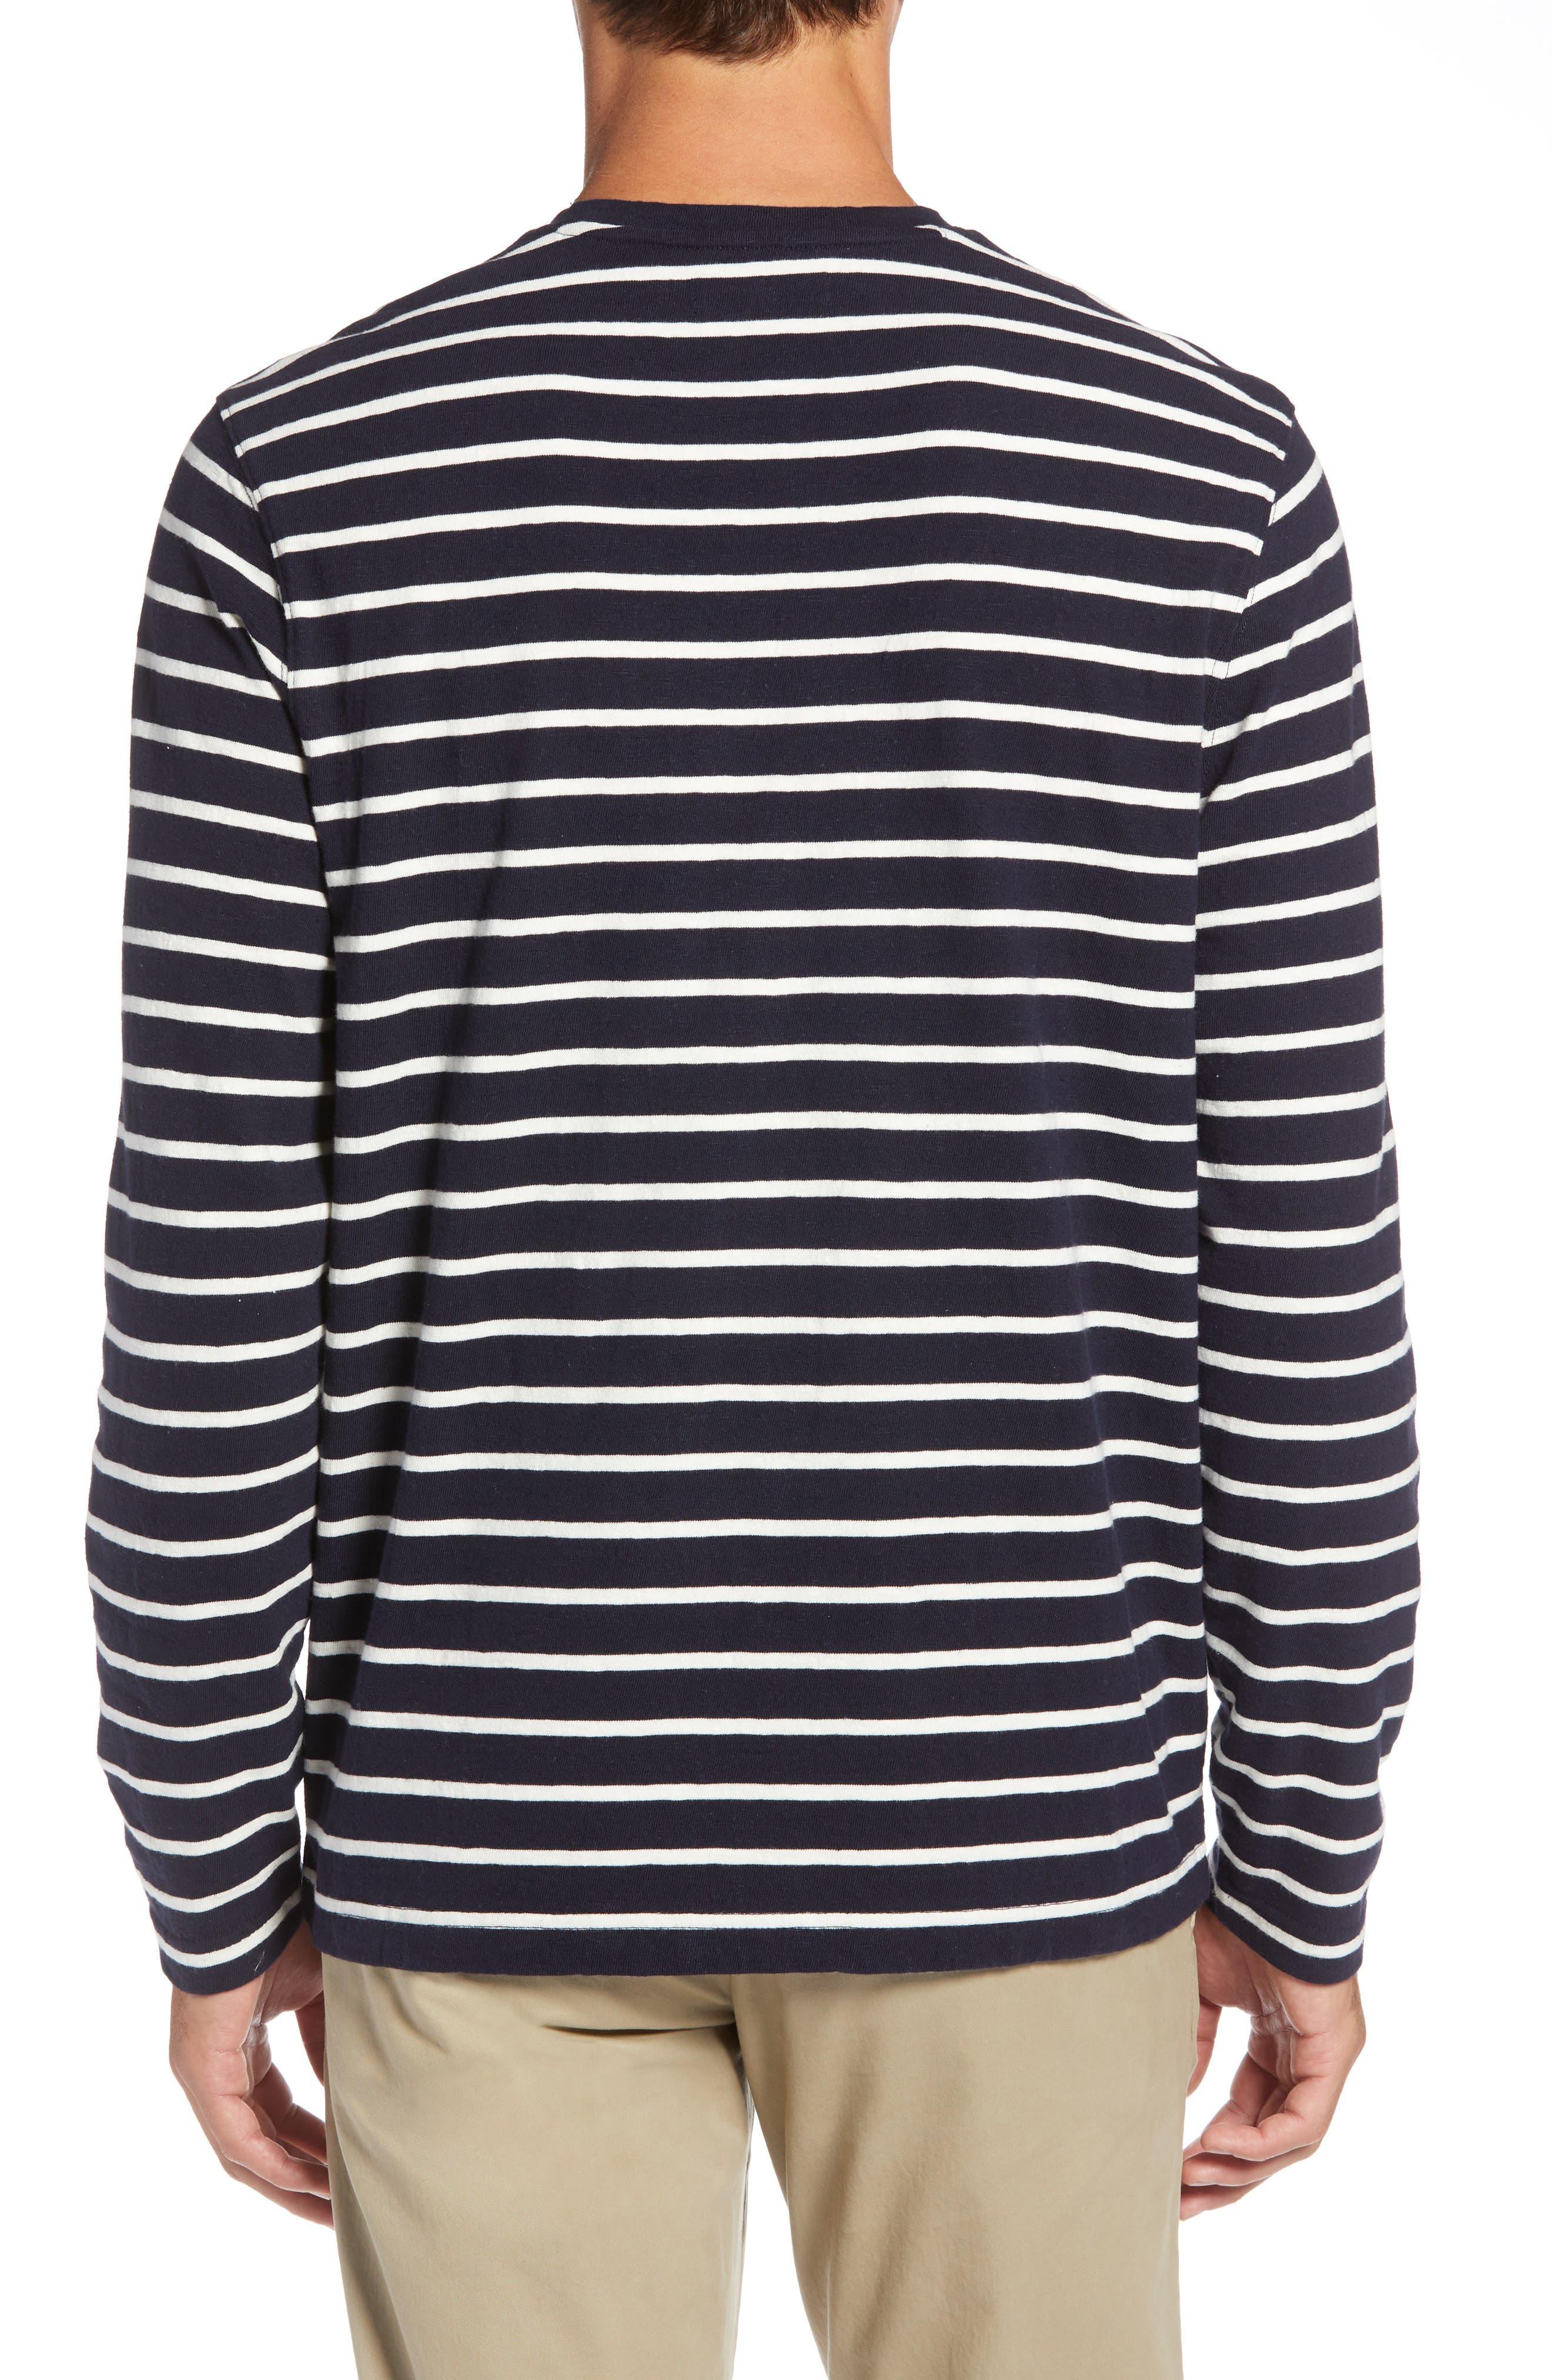 Stripe Long Sleeve T-Shirt,                             Alternate thumbnail 2, color,                             NAVY NIGHT ECRU STRIPE